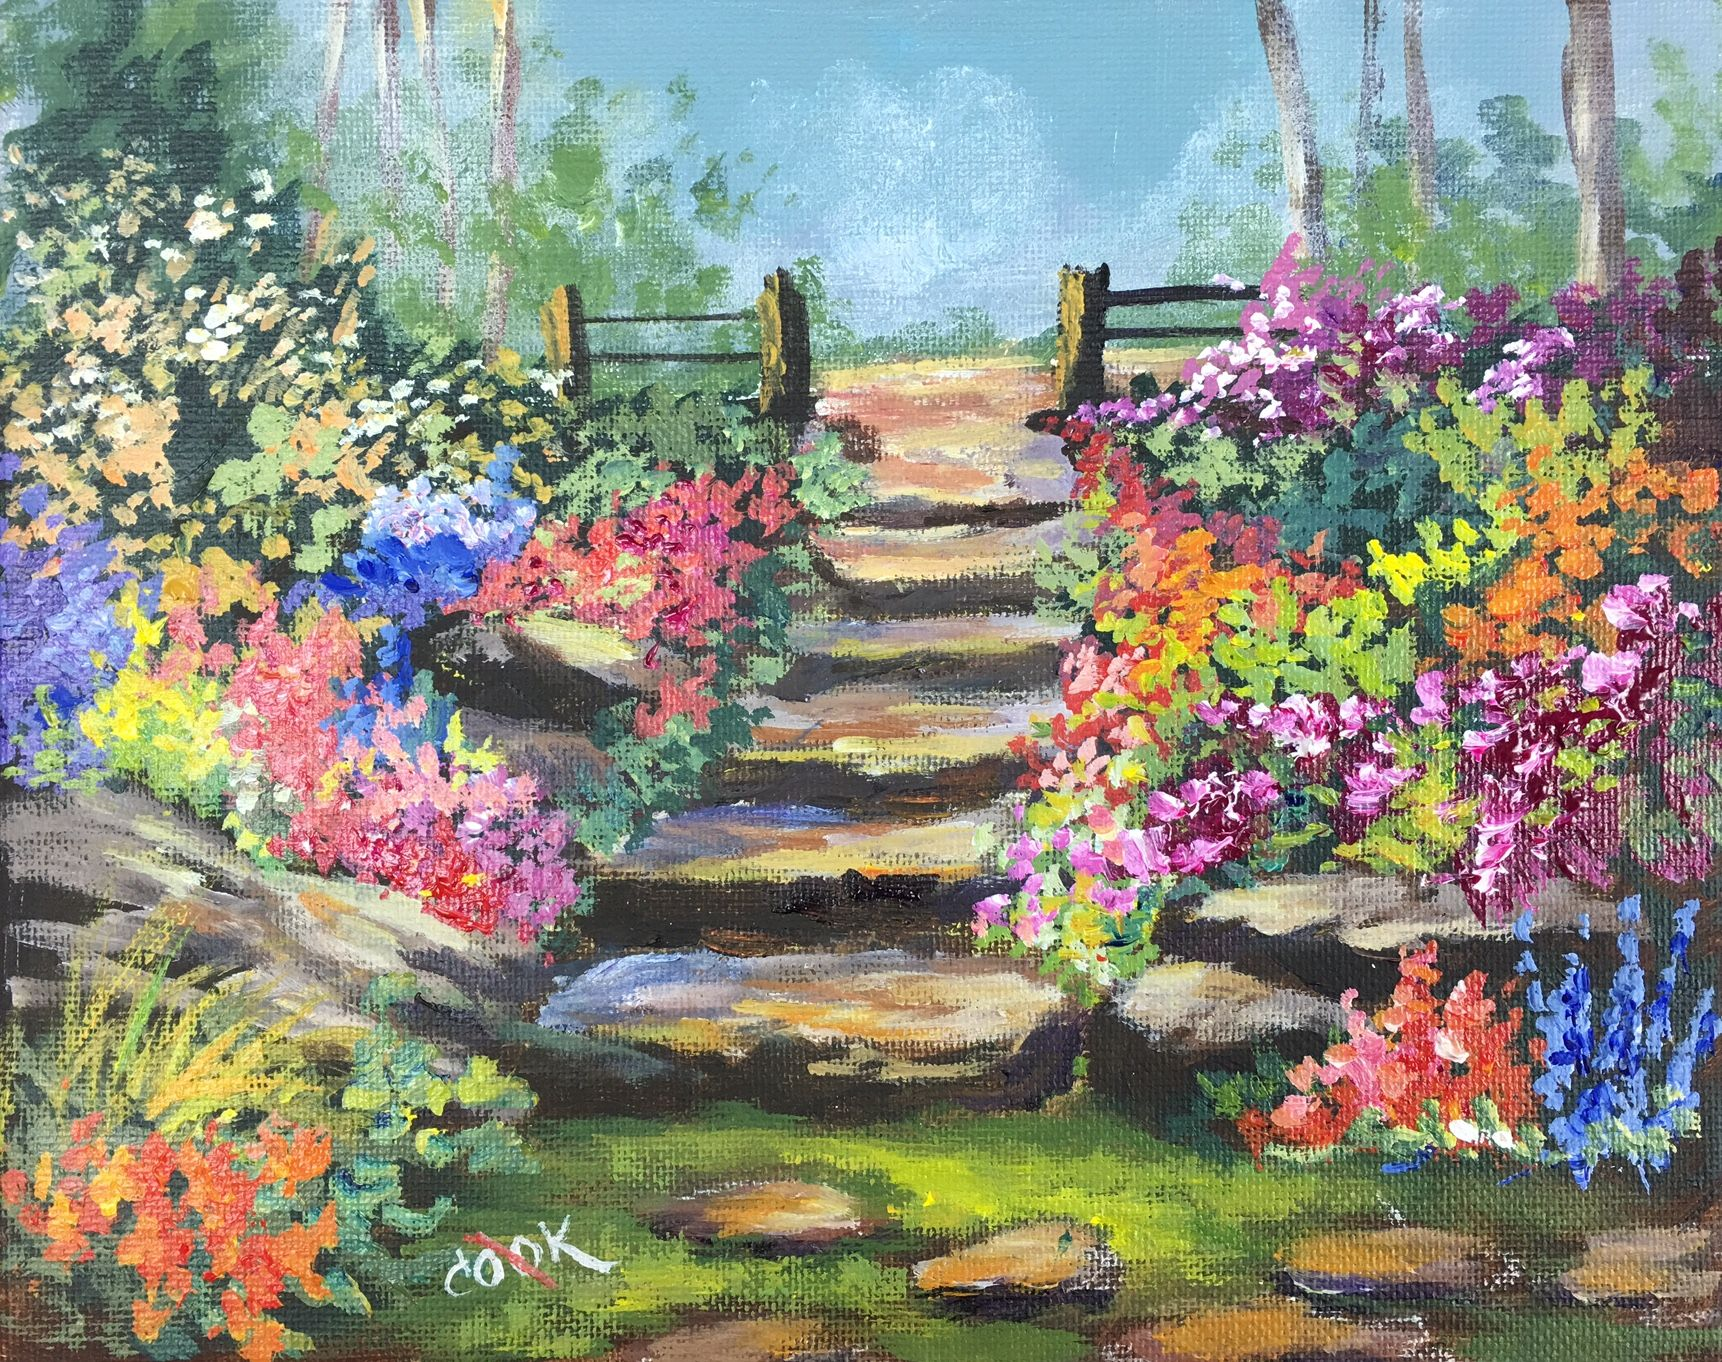 24 x 20 Original Acrylic Painting of Garden Path